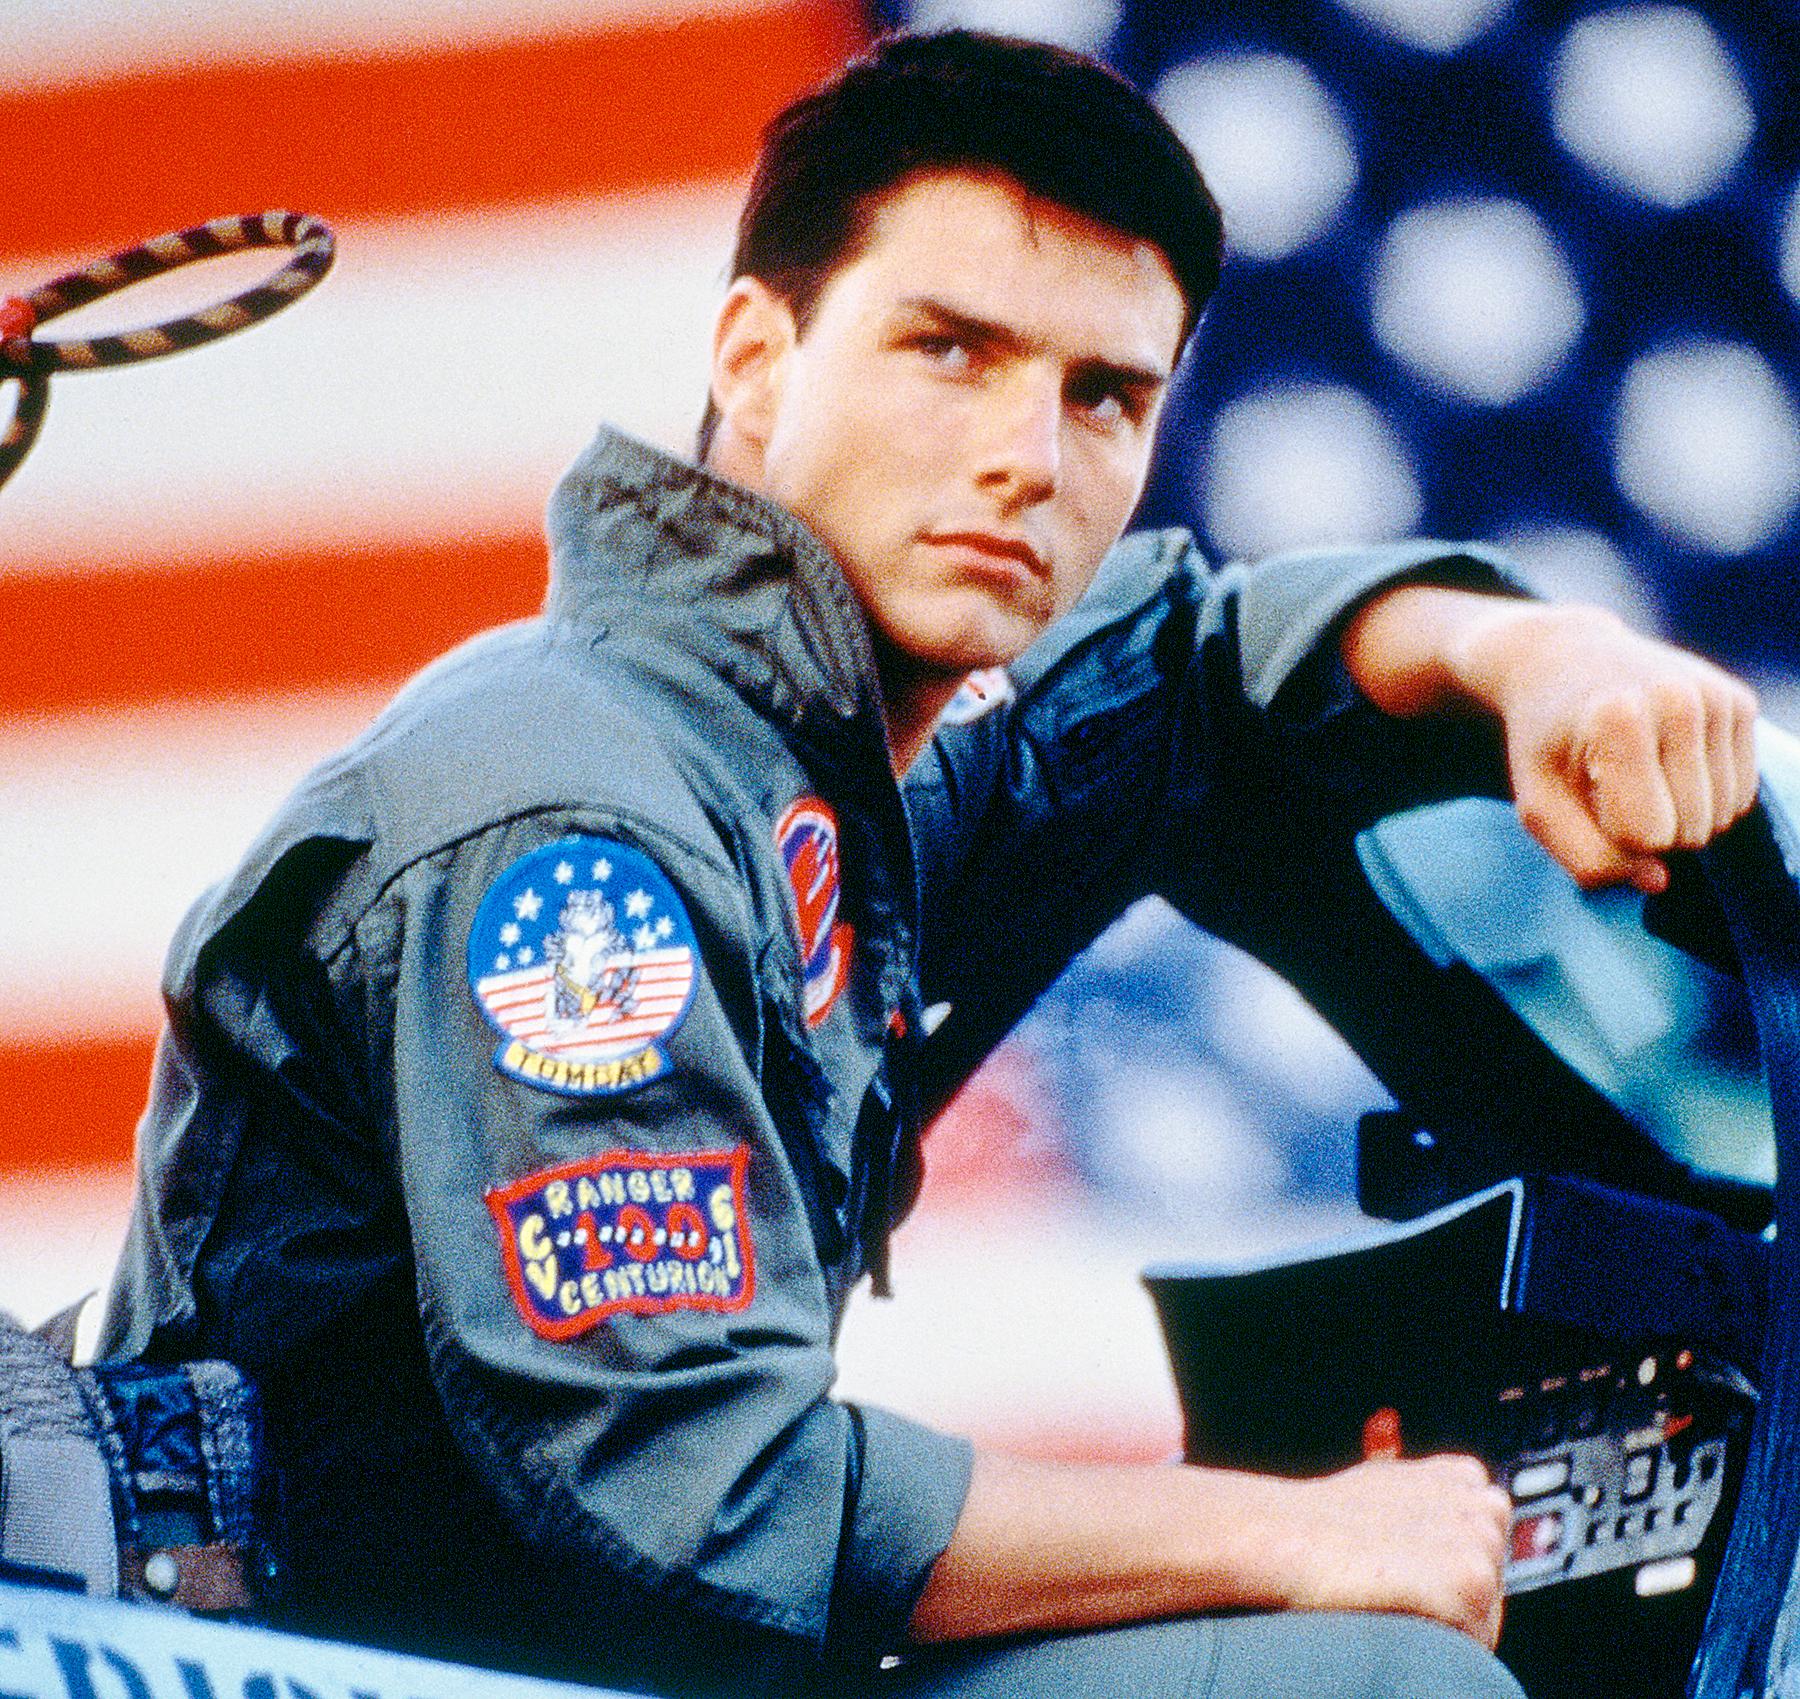 Tom Cruise, as Lieutenant Pete 'Maverick' Mitchell, in 'Top Gun', 1986.